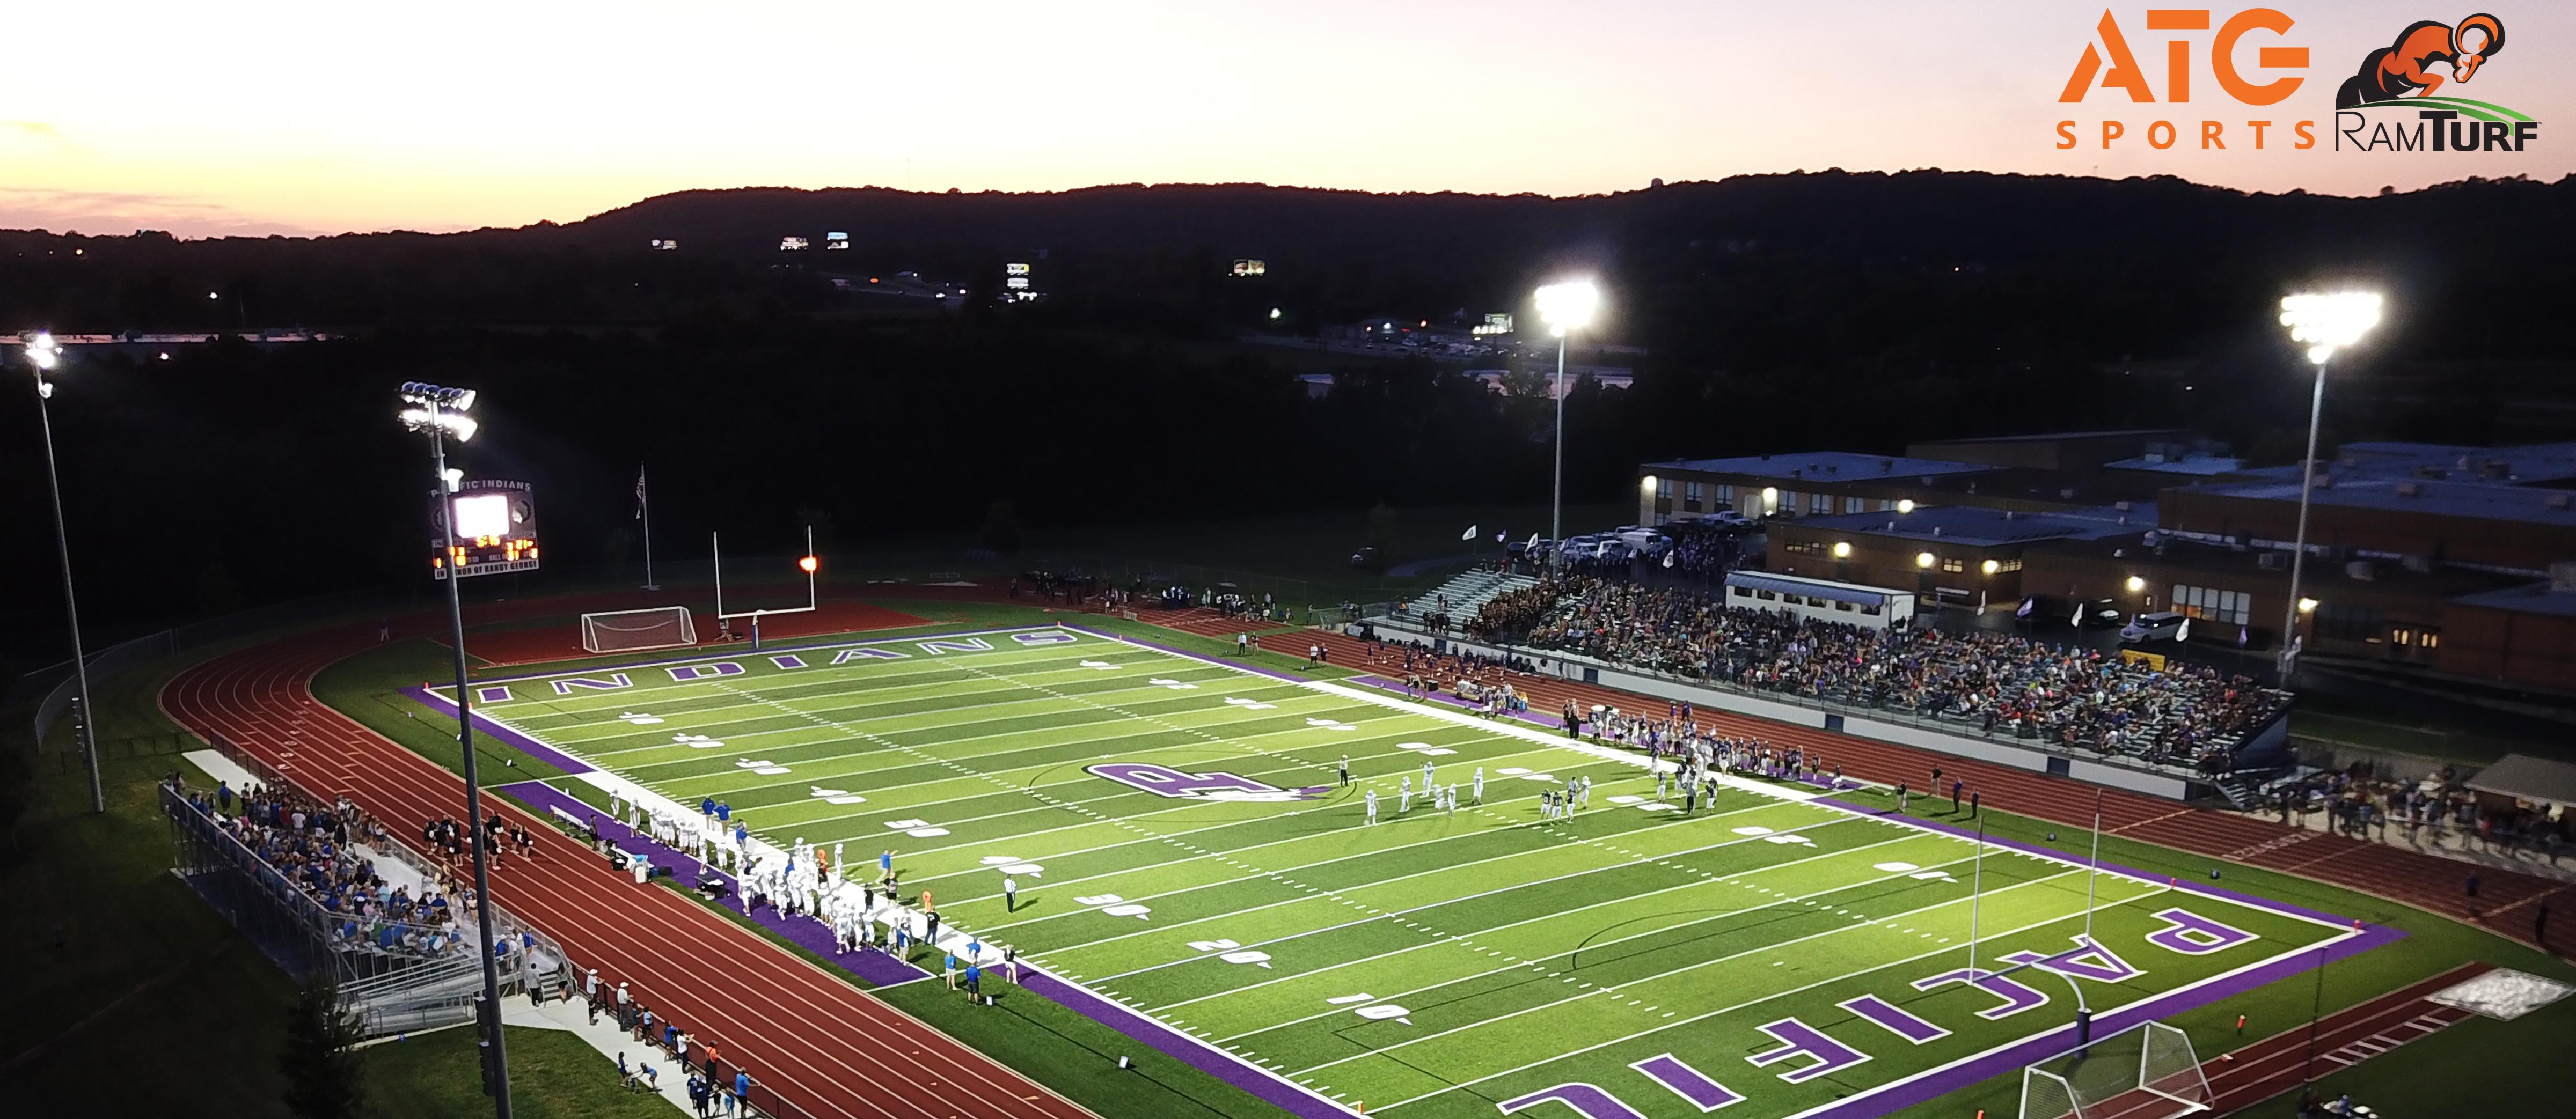 field under lights